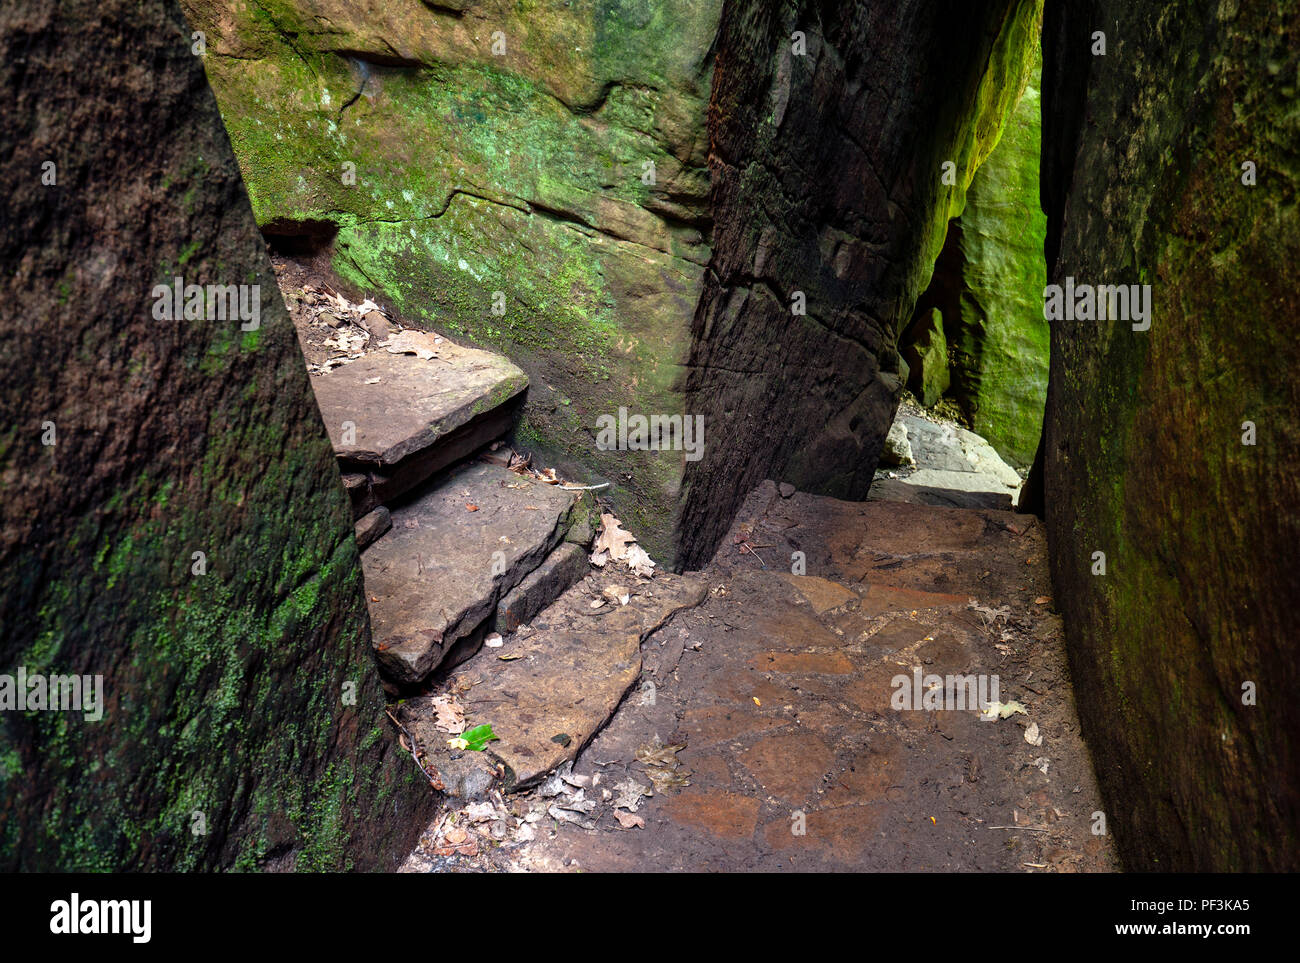 Rim Rock National Recreation Trail, Shawnee National Forest, Illinois, USA Stock Photo